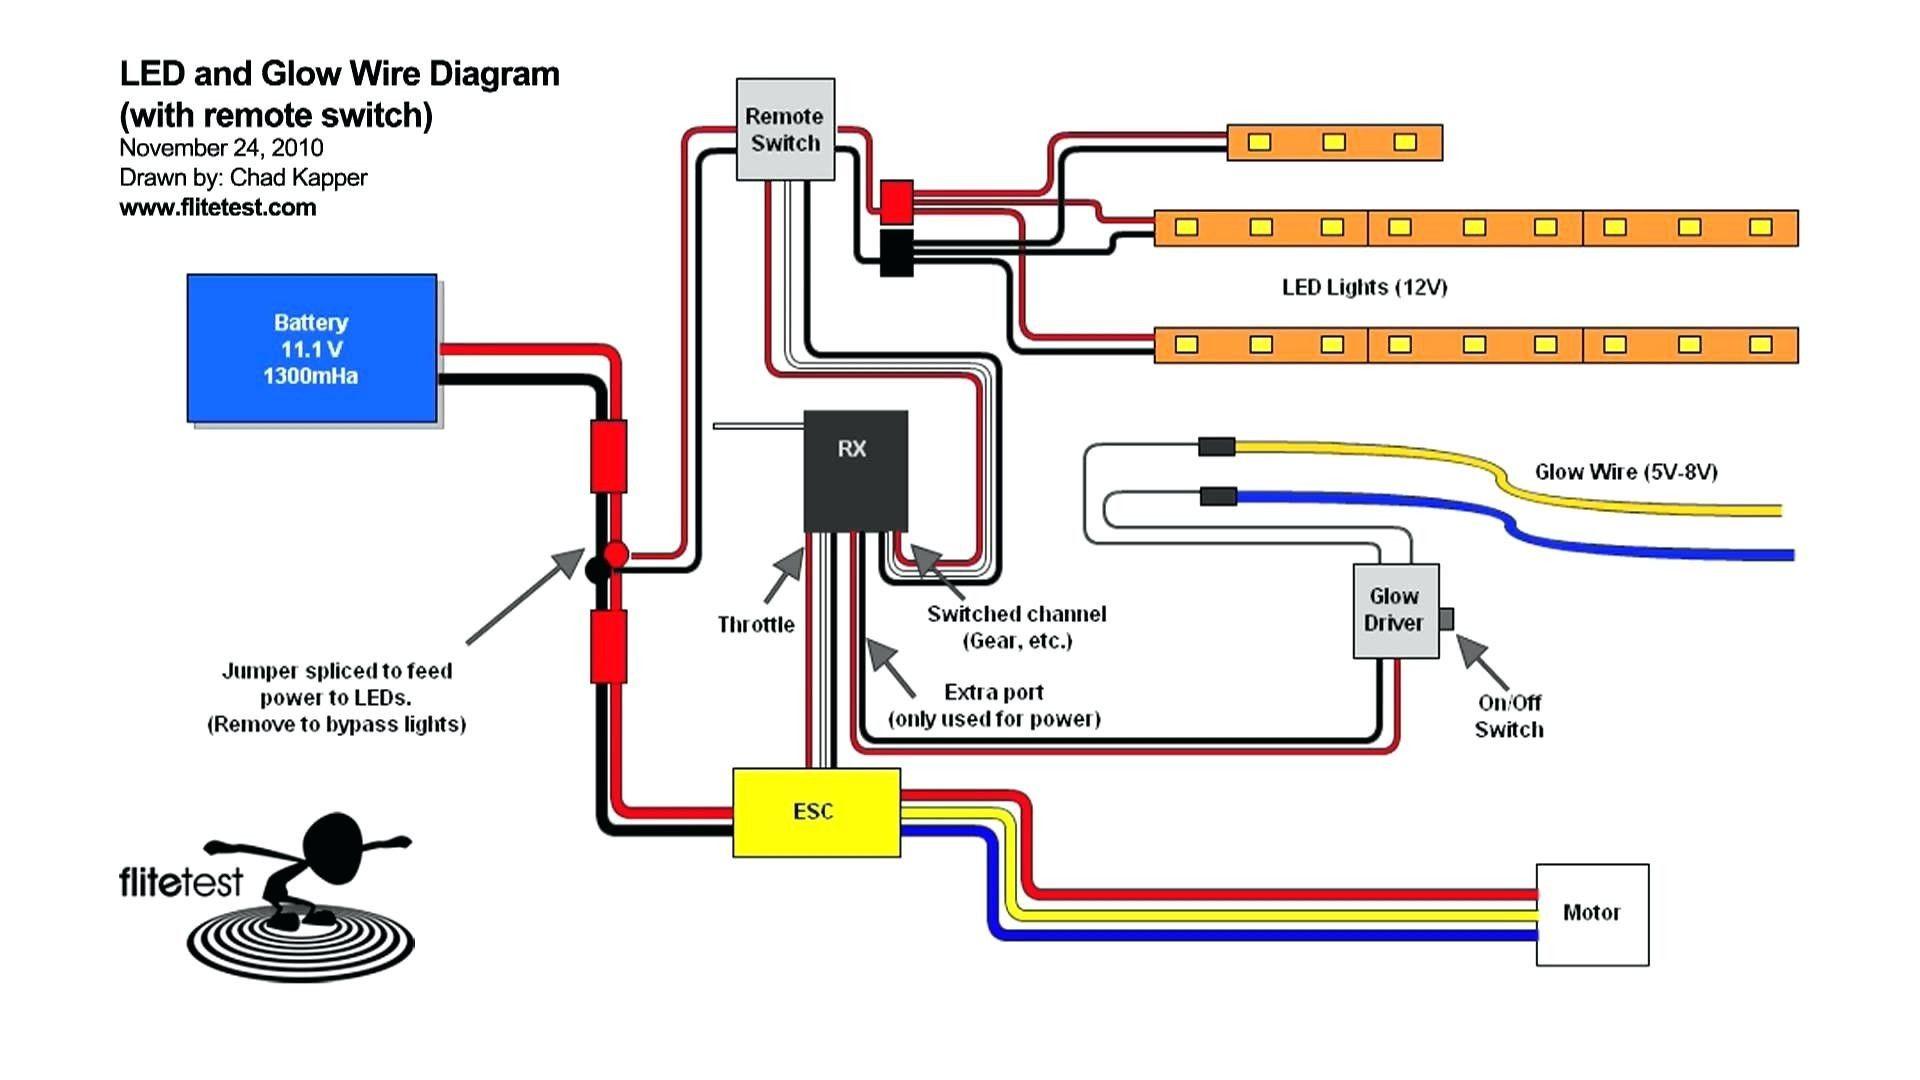 yamaha jet boat dual battery wiring diagram pin by john houston on wiring diagram sample diagram  electrical  pin by john houston on wiring diagram